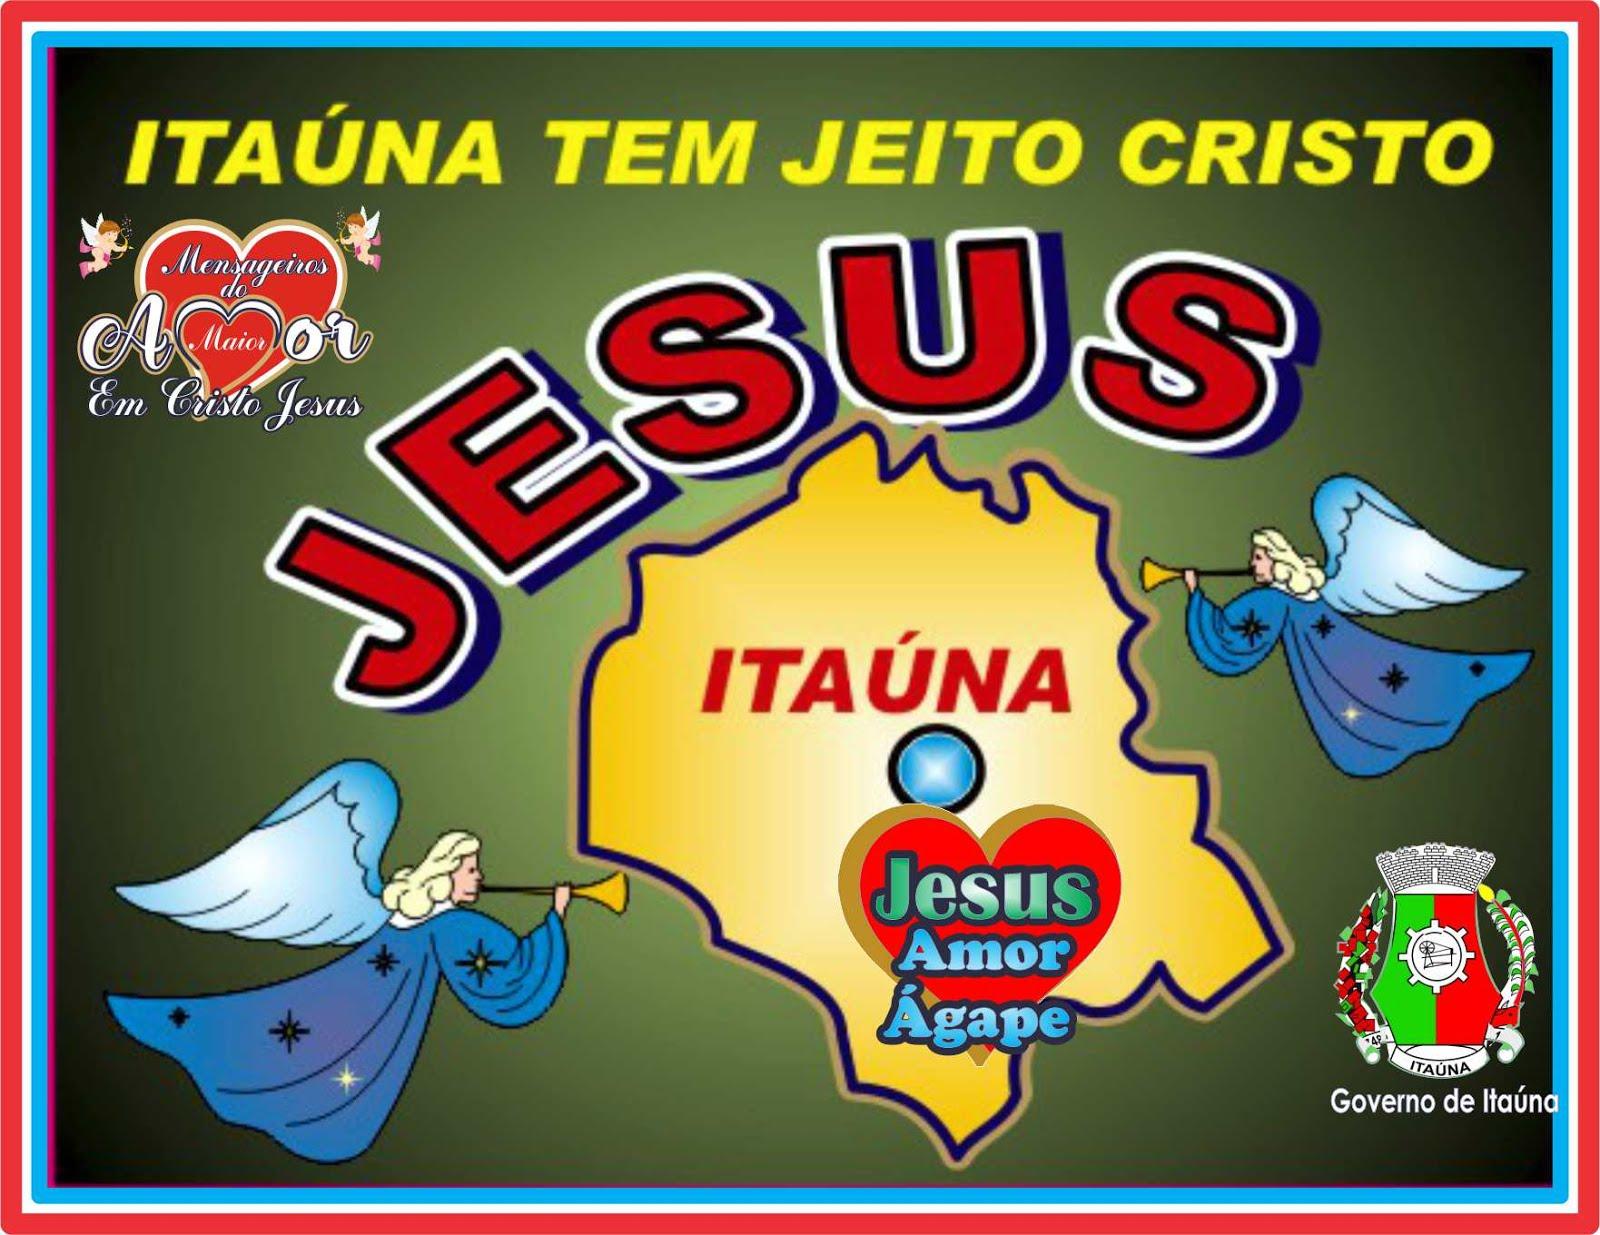 Itaúna Tem Jeito Jesus Cristo